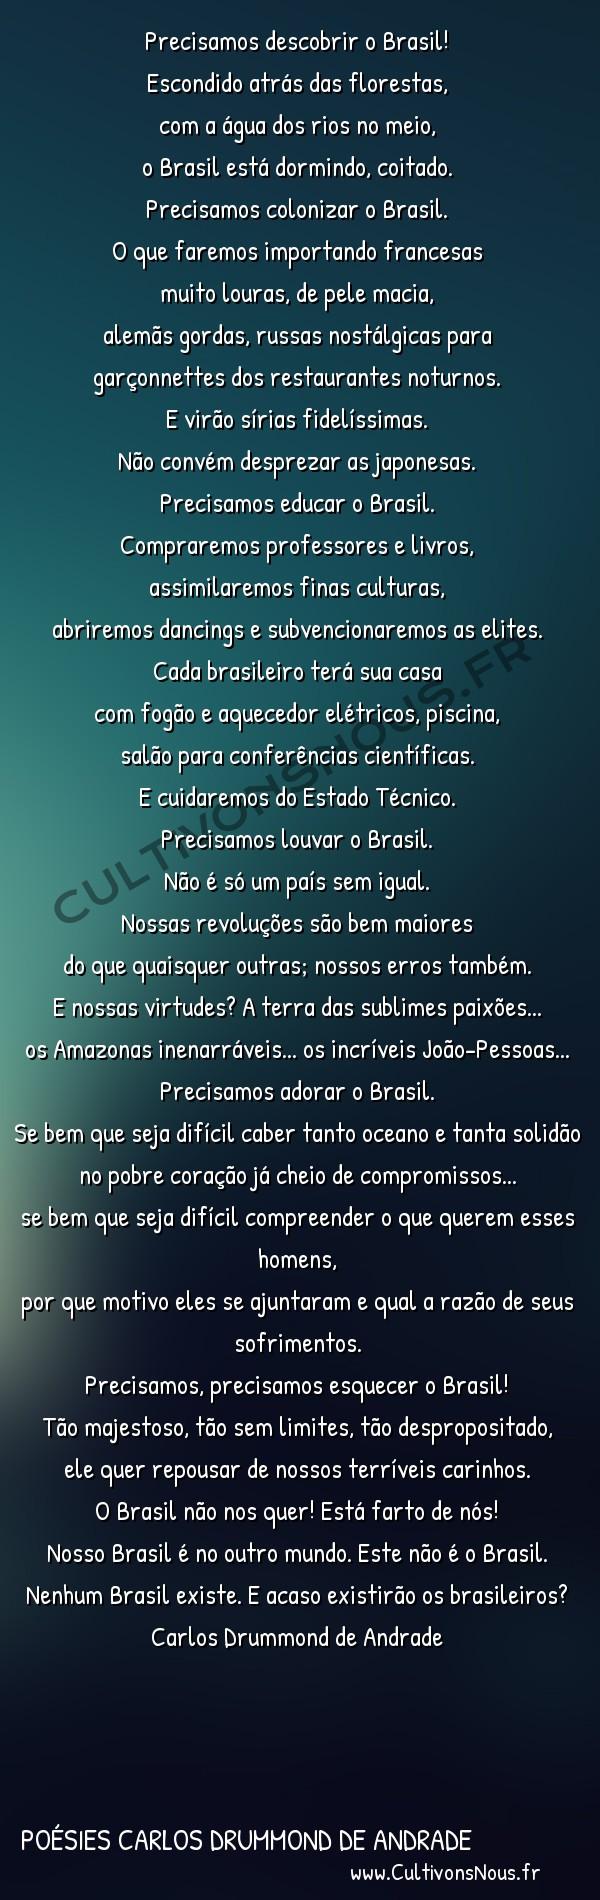 Poésies Brésiliennes - Auteurs Brésiliens - Poète Carlos Drummond de Andrade - Poésies Carlos Drummond de Andrade - Hino nacional -  Precisamos descobrir o Brasil! Escondido atrás das florestas,